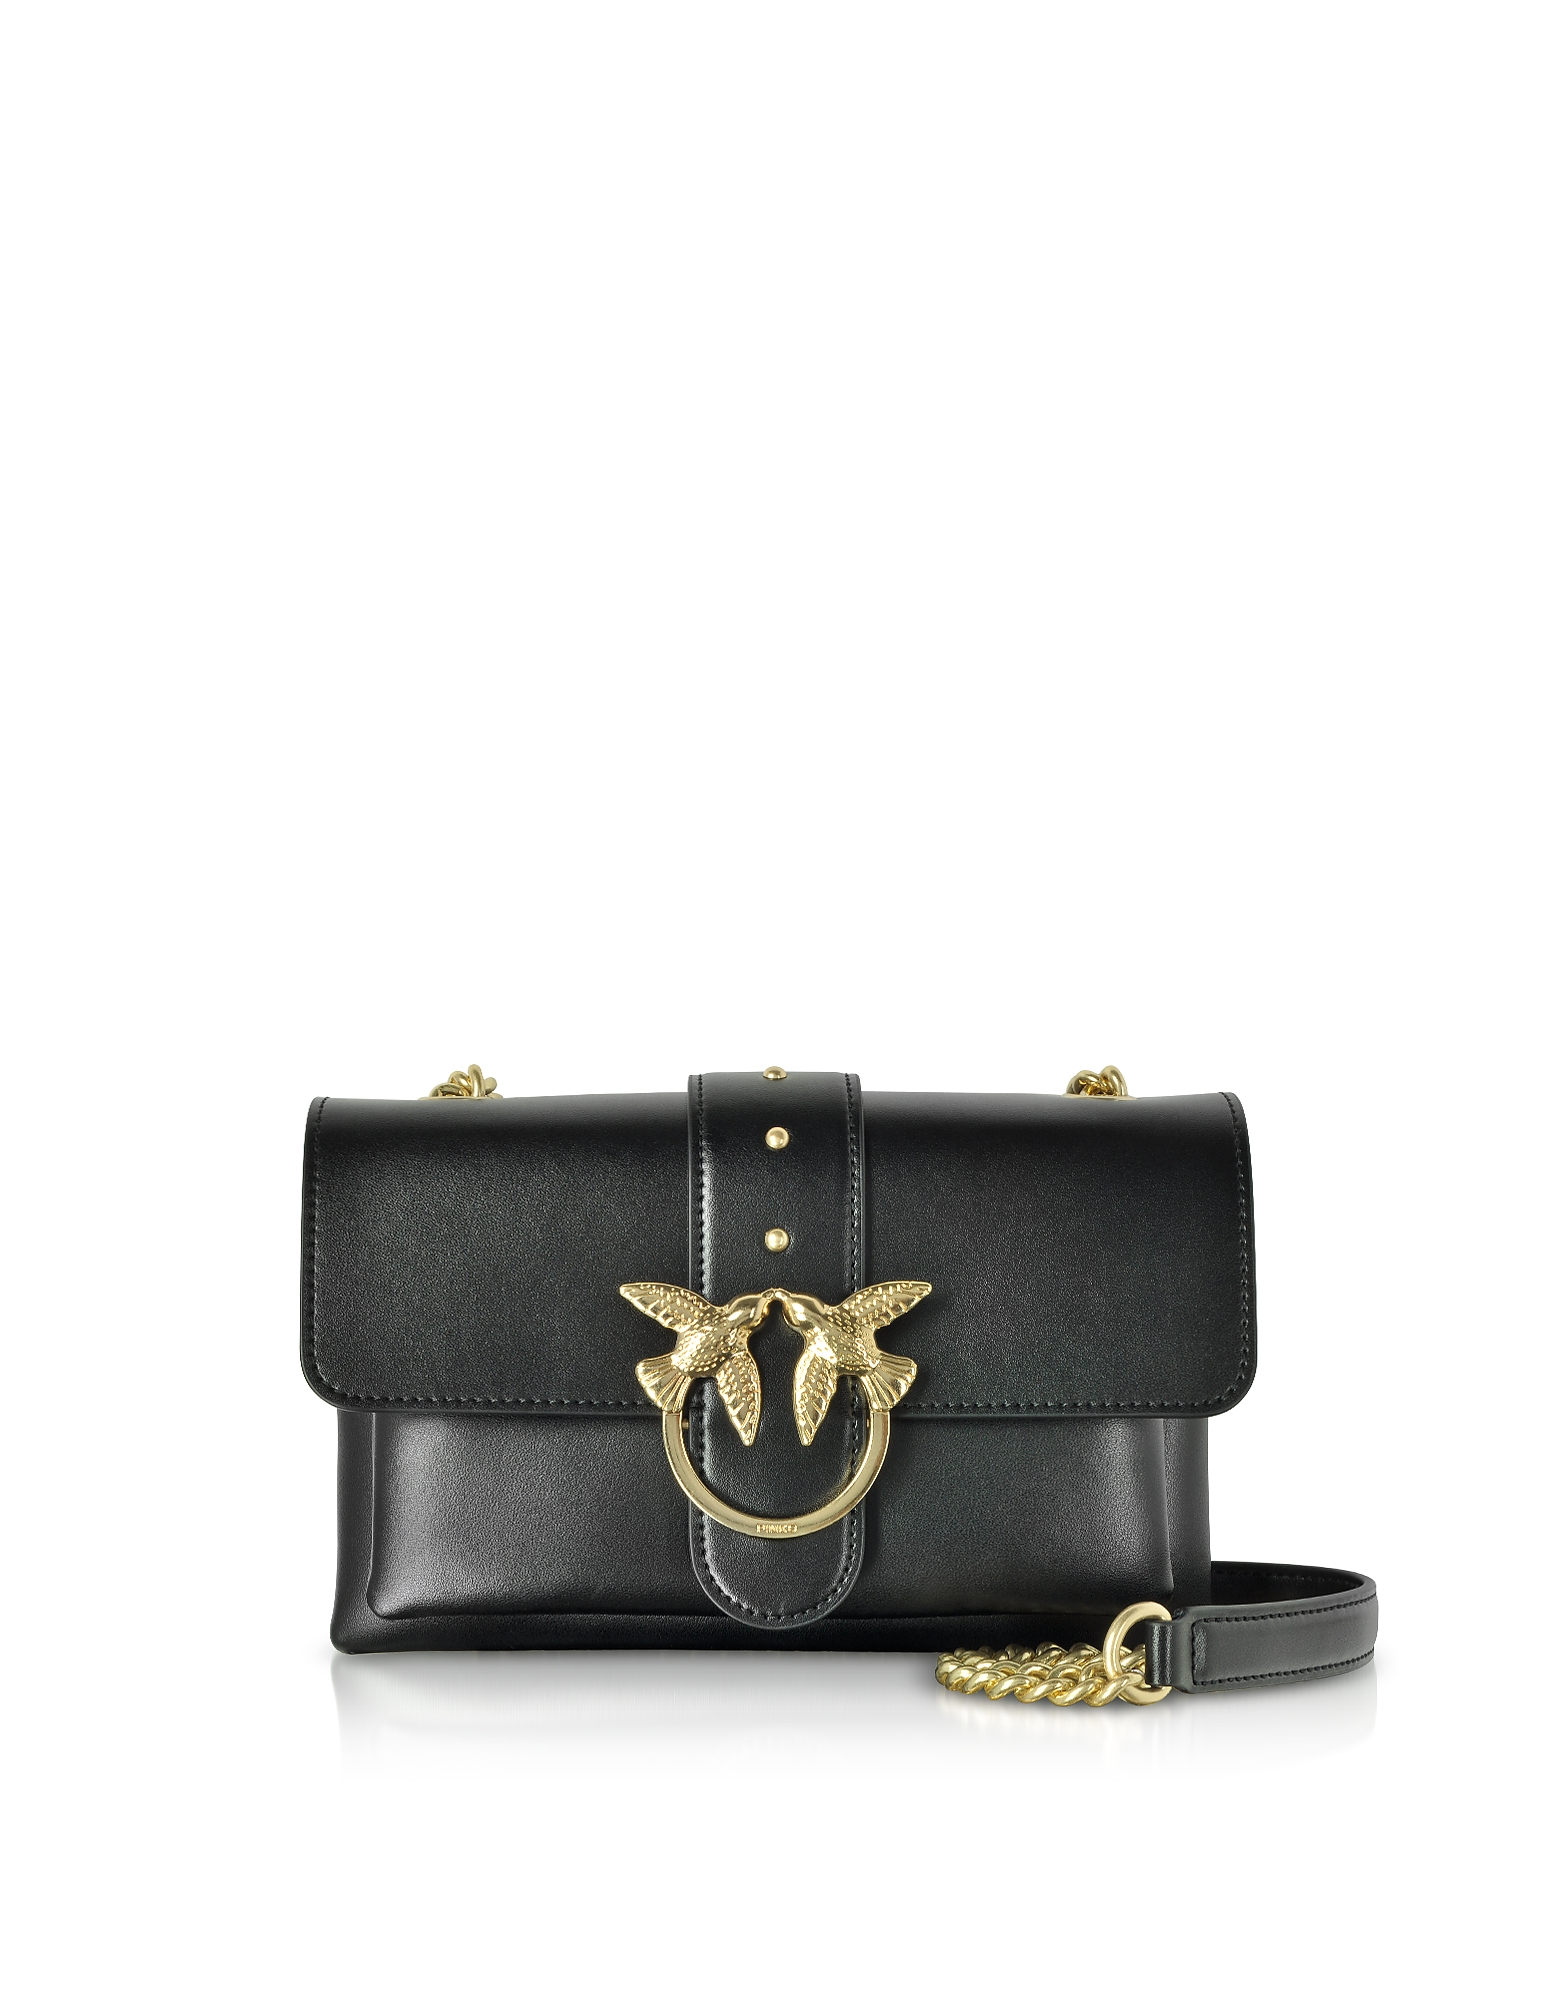 Pinko Designer Handbags, Mini Love Soft Shoulder Bag